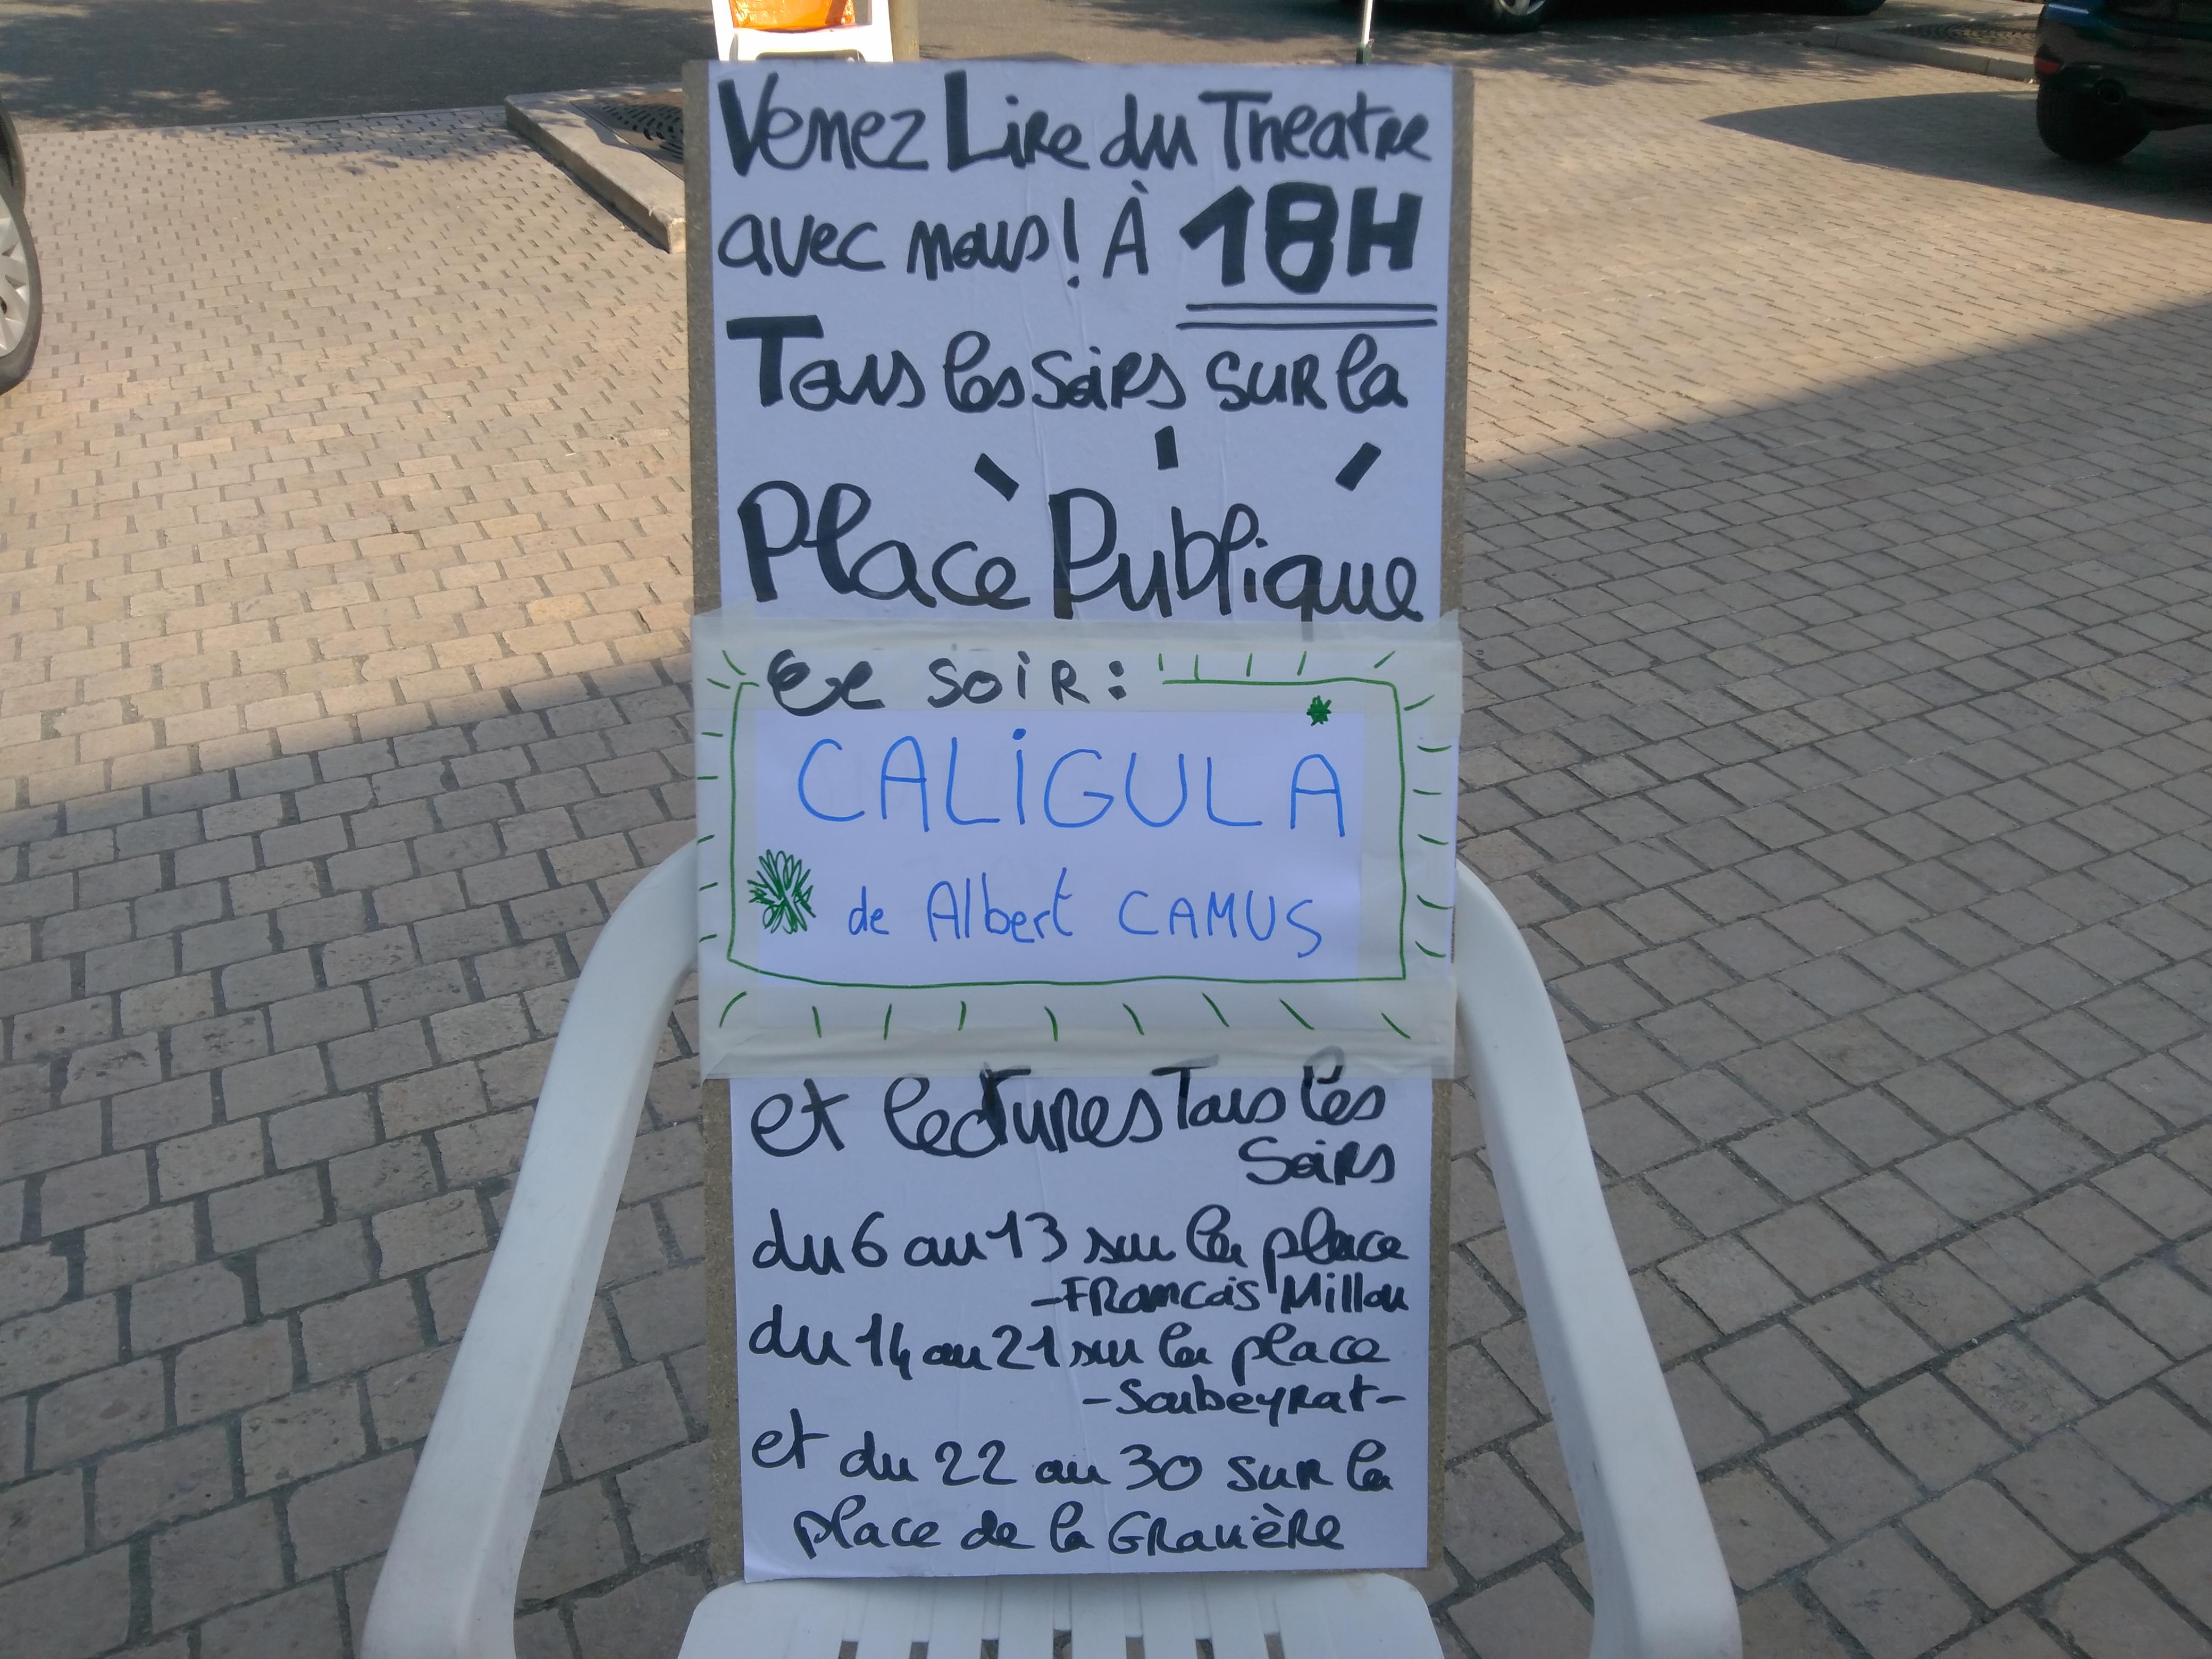 Ce soir, Lecture de CALIGULA, de Albert Camus!